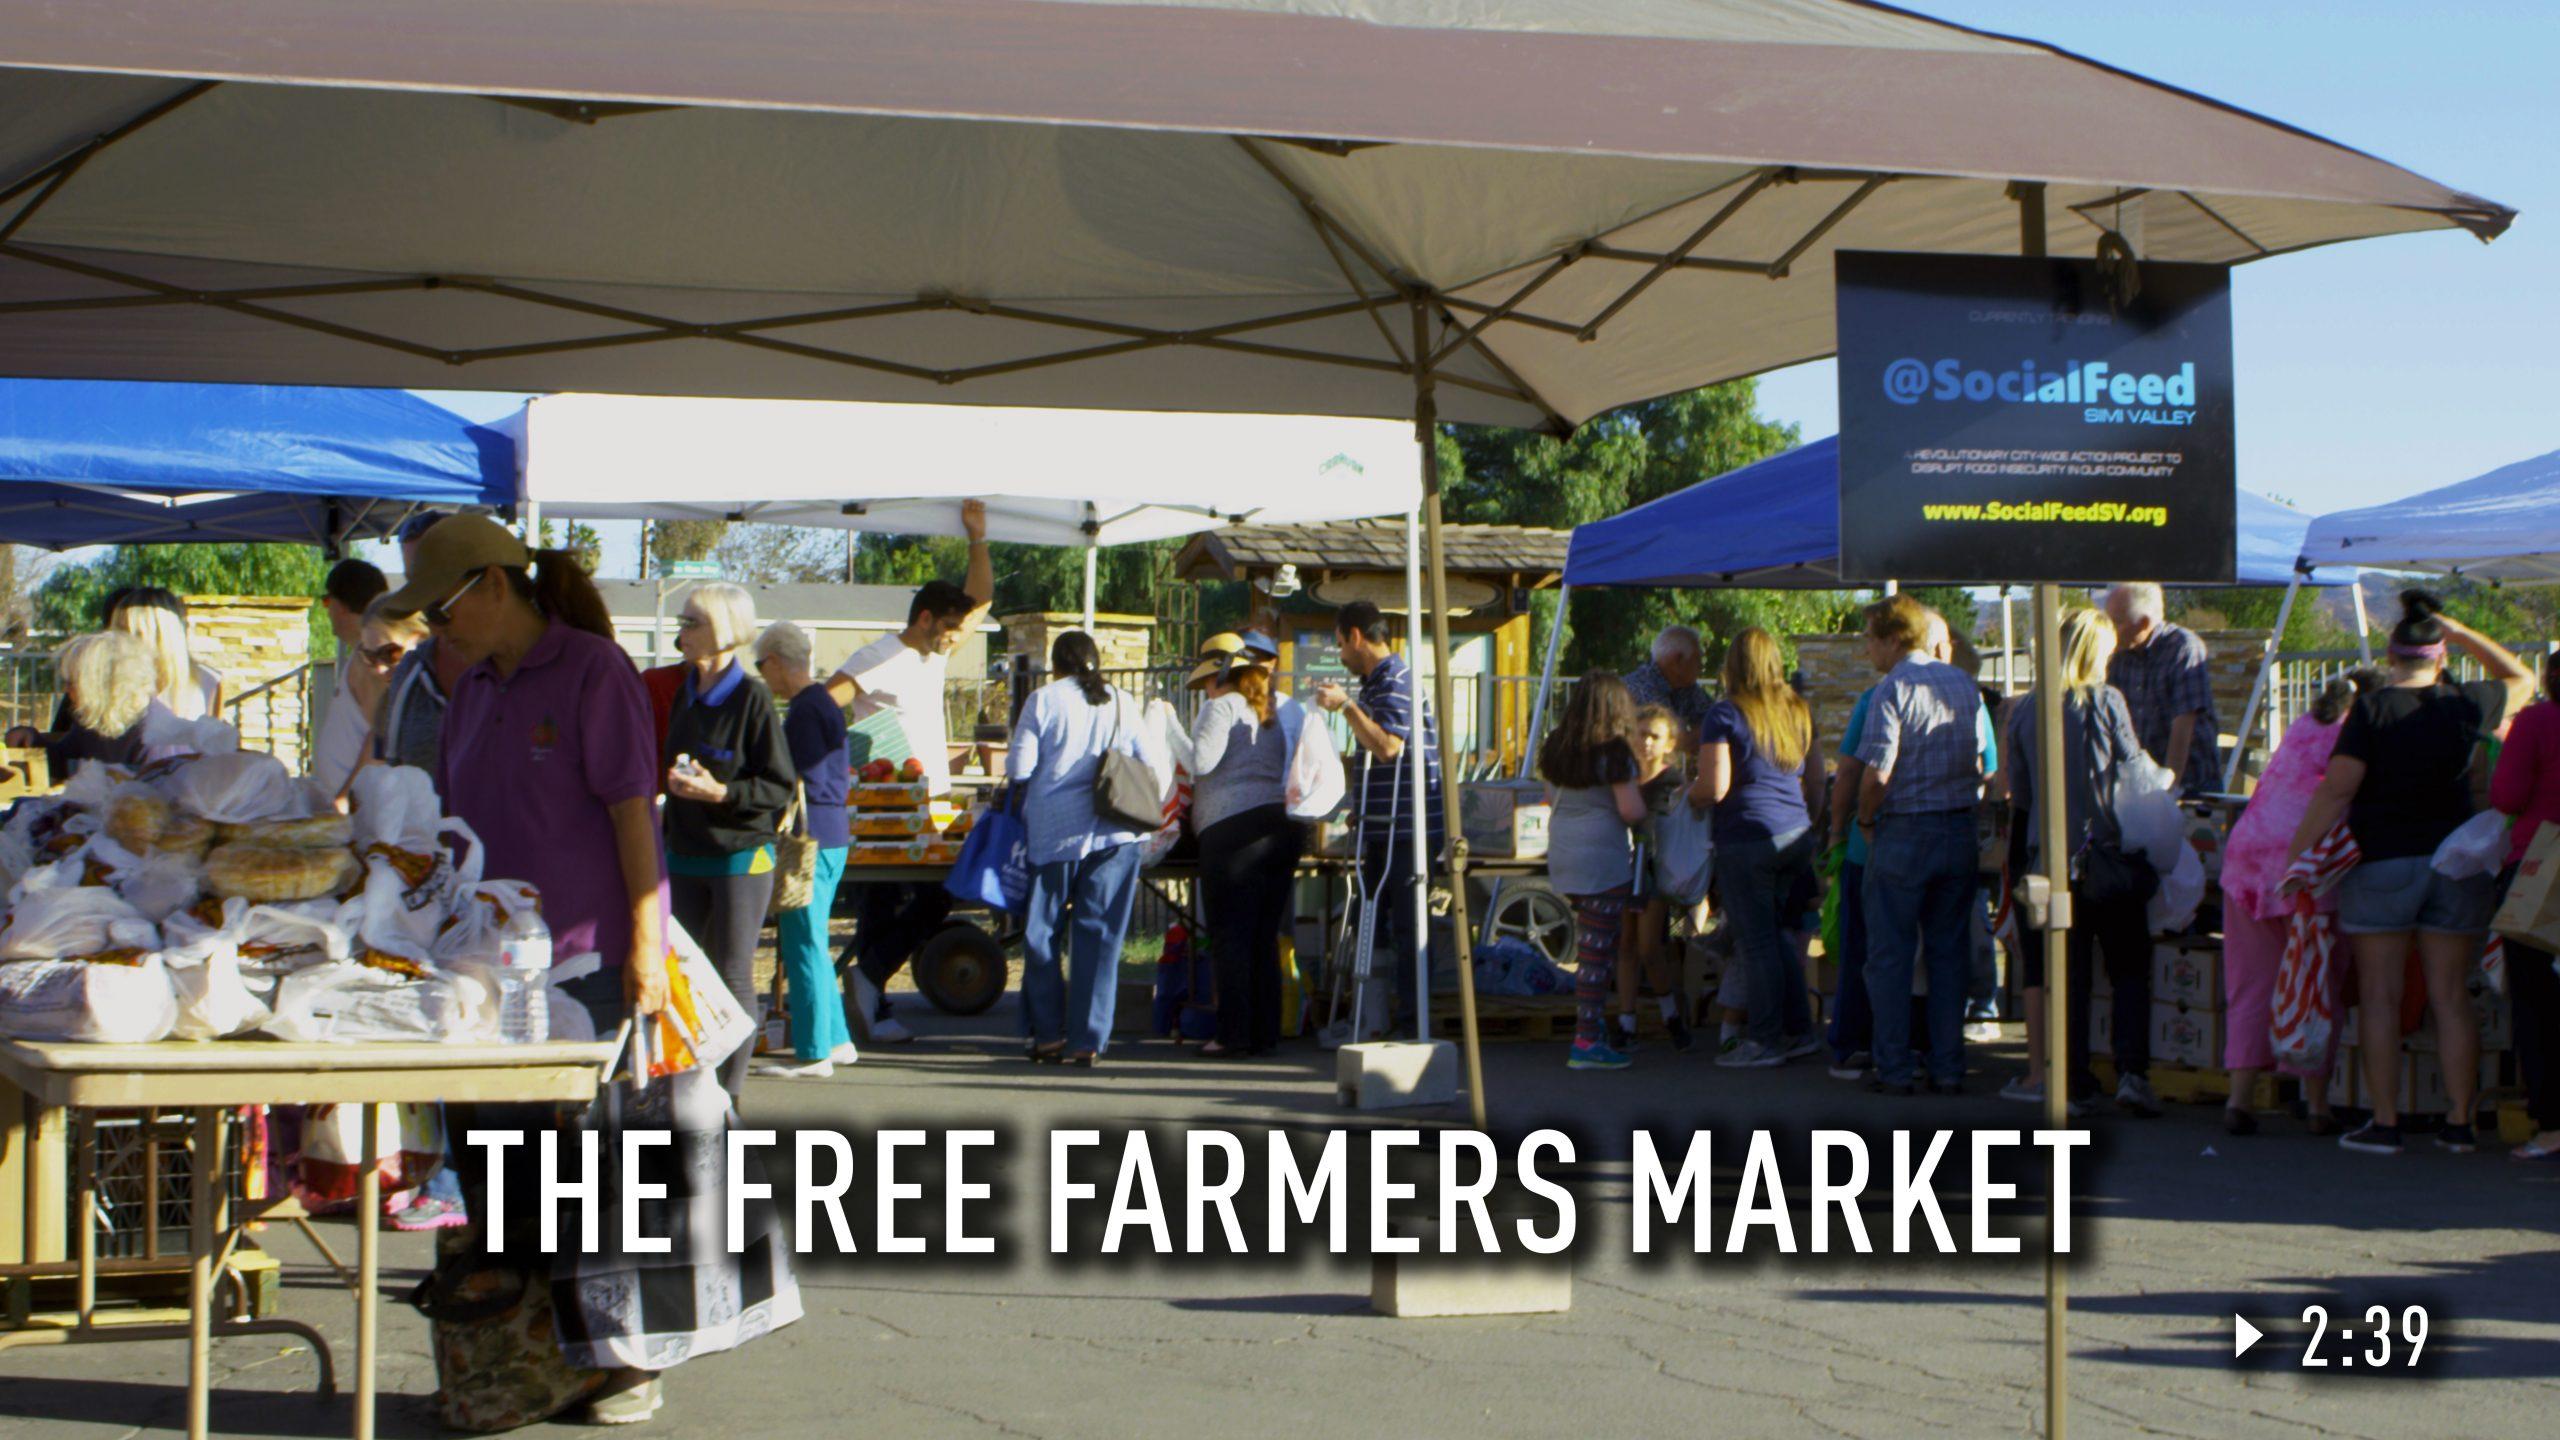 The Free Farmers Market